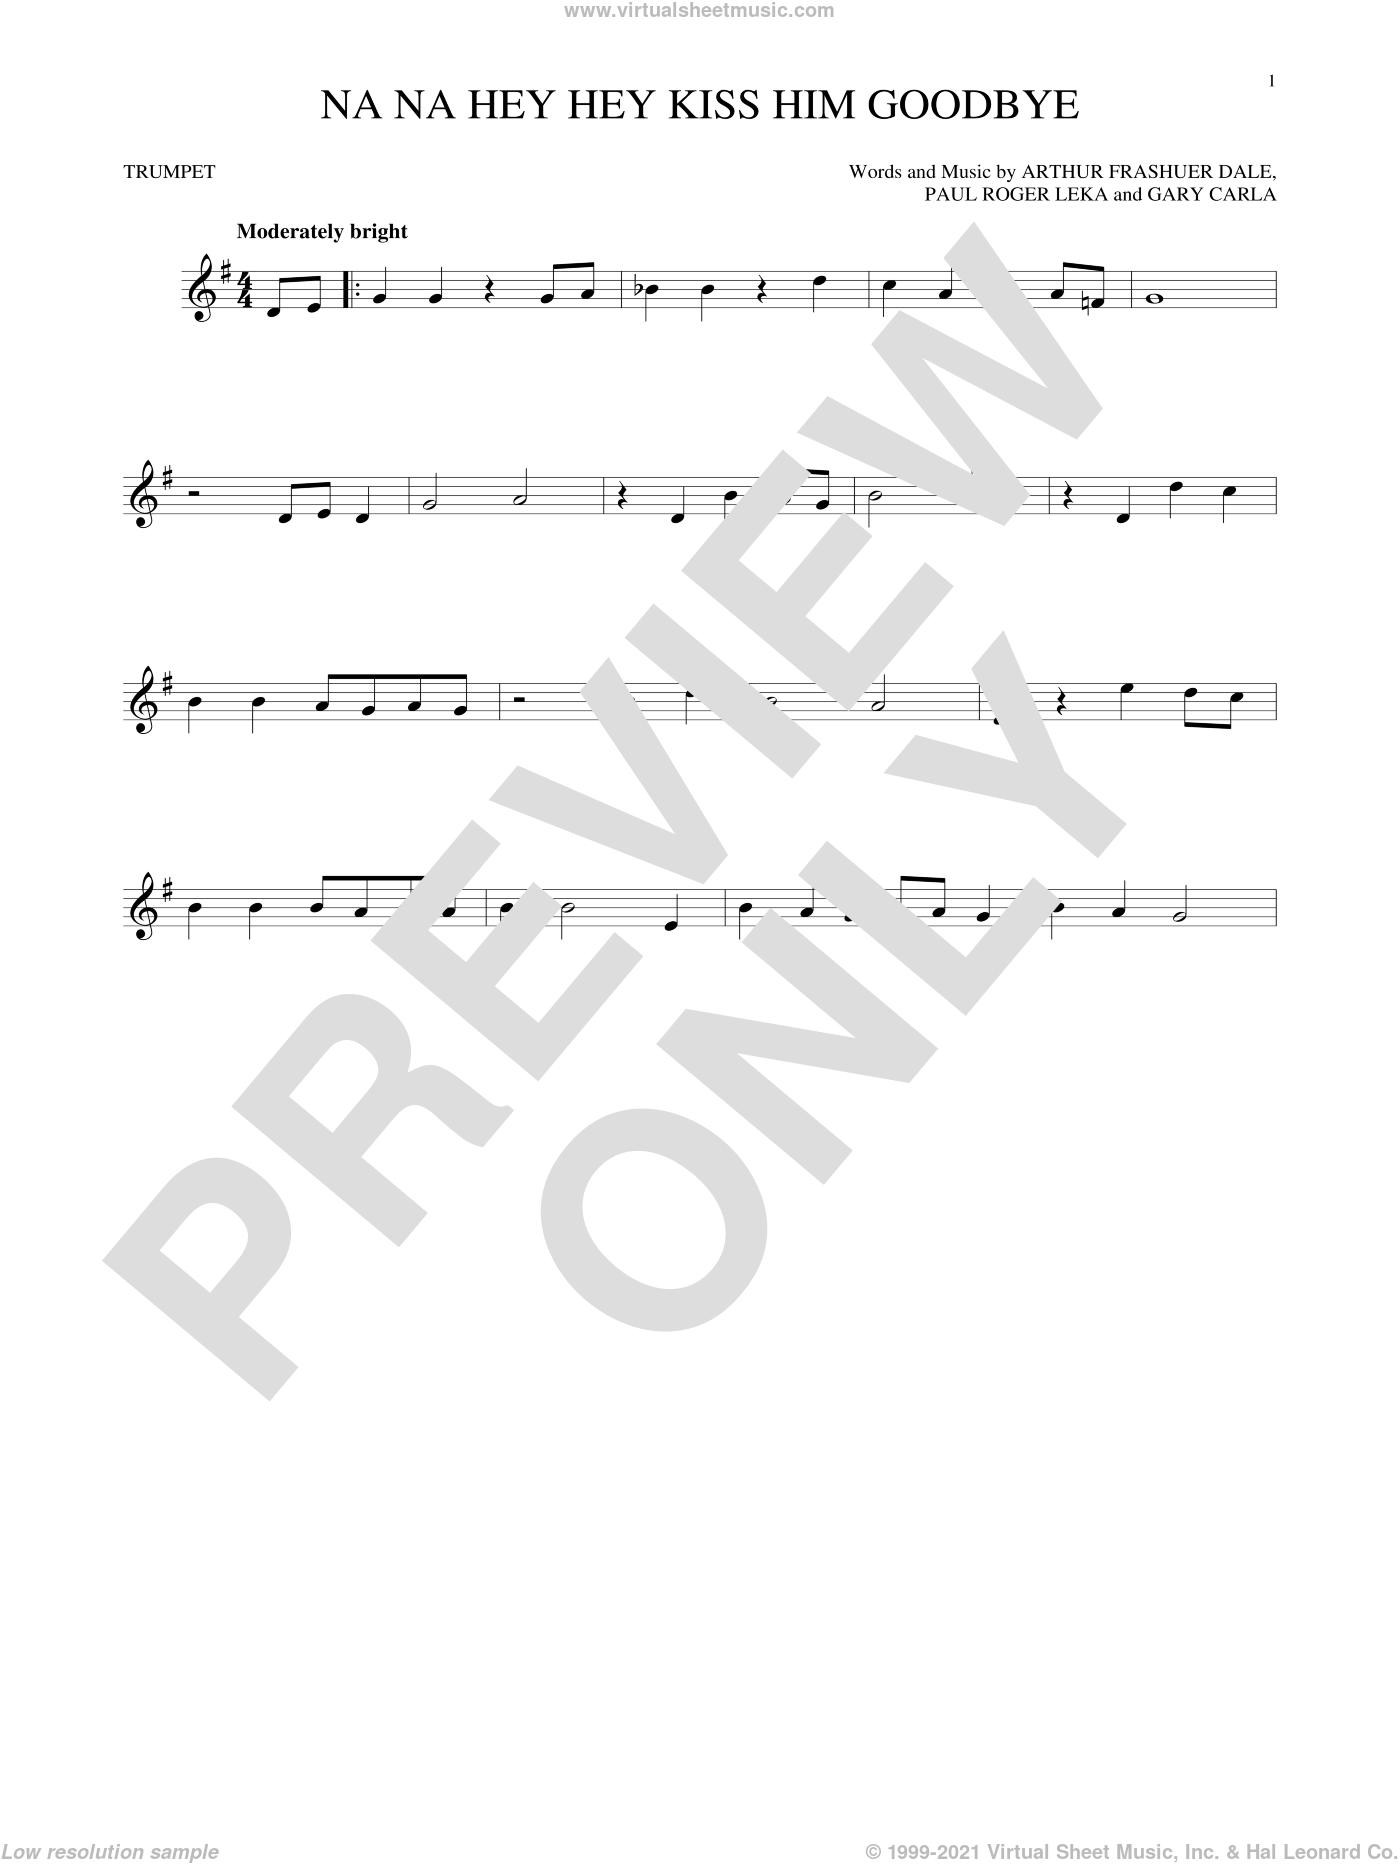 Na Na Hey Hey Kiss Him Goodbye sheet music for trumpet solo by Steam, Dale Frashuer, Gary De Carlo and Paul Leka, intermediate skill level